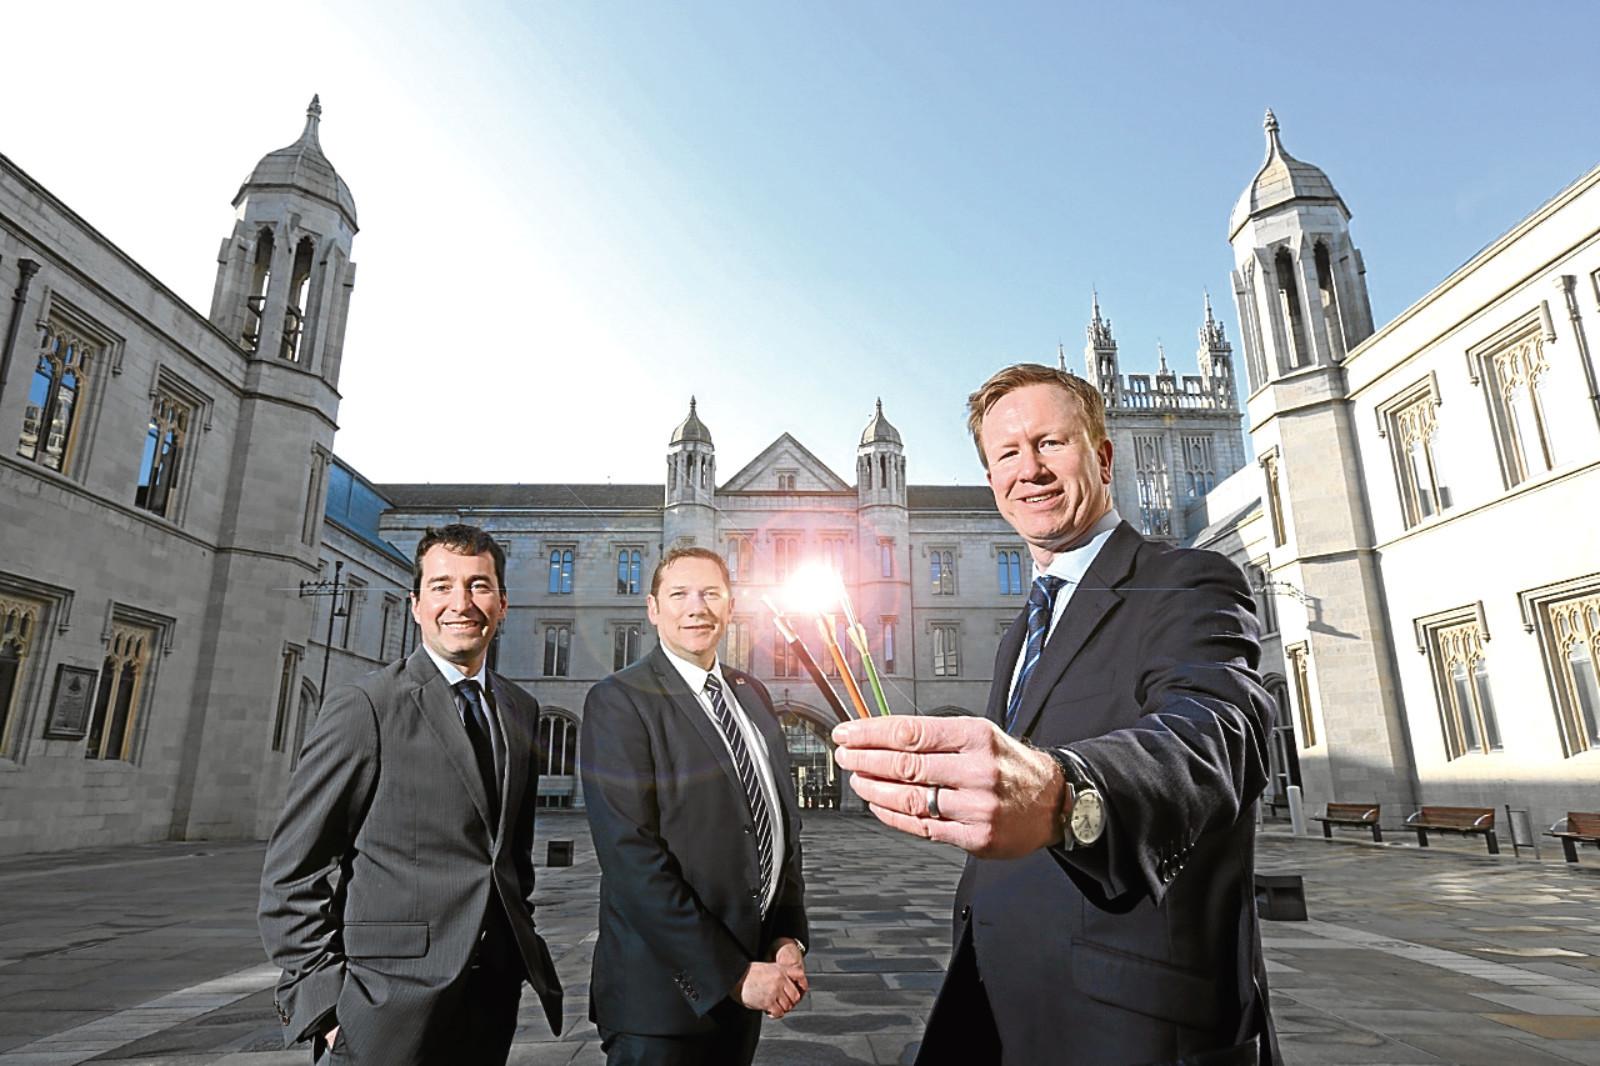 l-r Guilhem Poussot (Vodafone), Councillor Douglas Lumsden and Council leader Rob Hamlin at the launch of the CityFibre roll-out